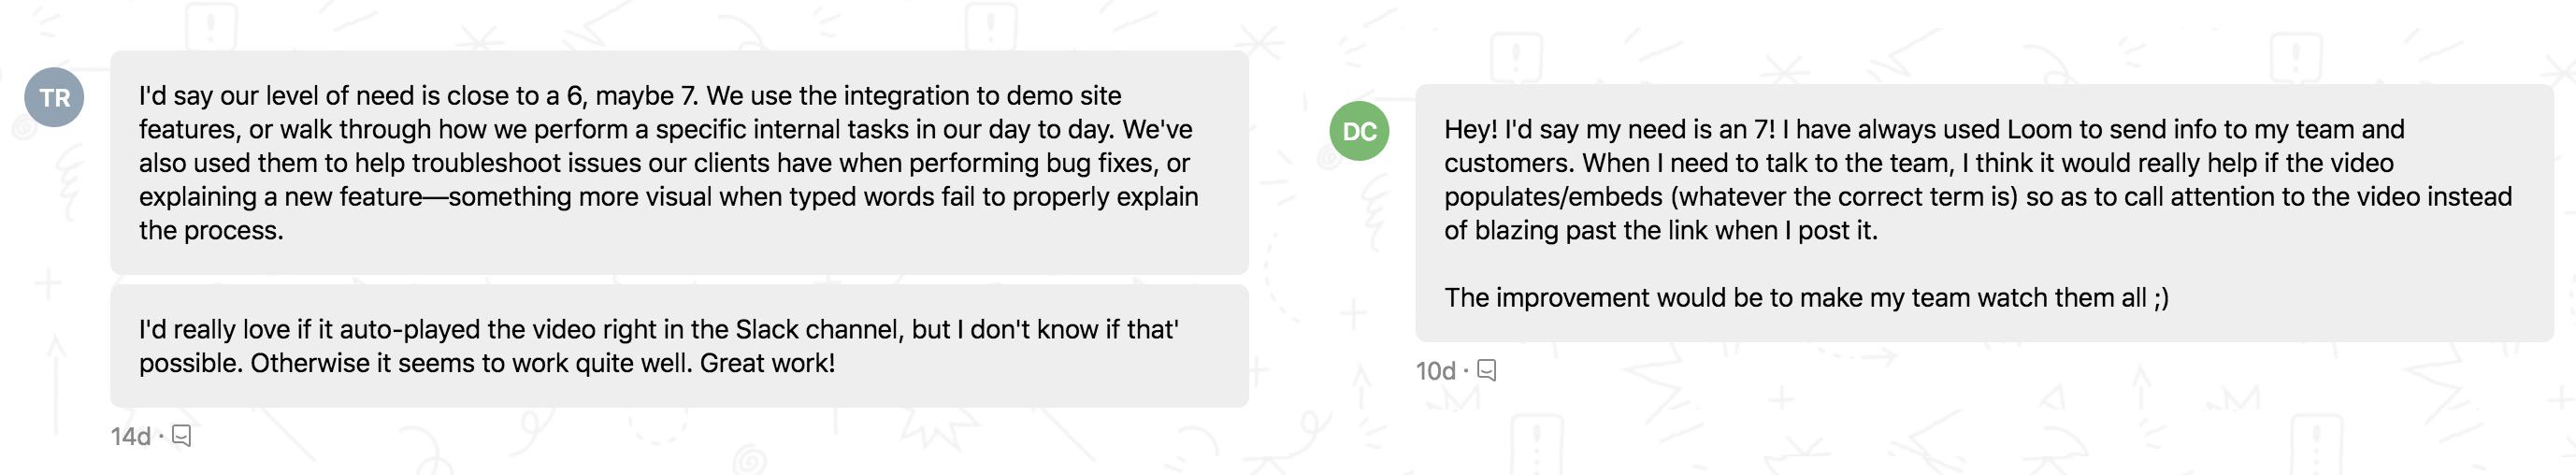 Slack meet Loom: The story of how work communication is